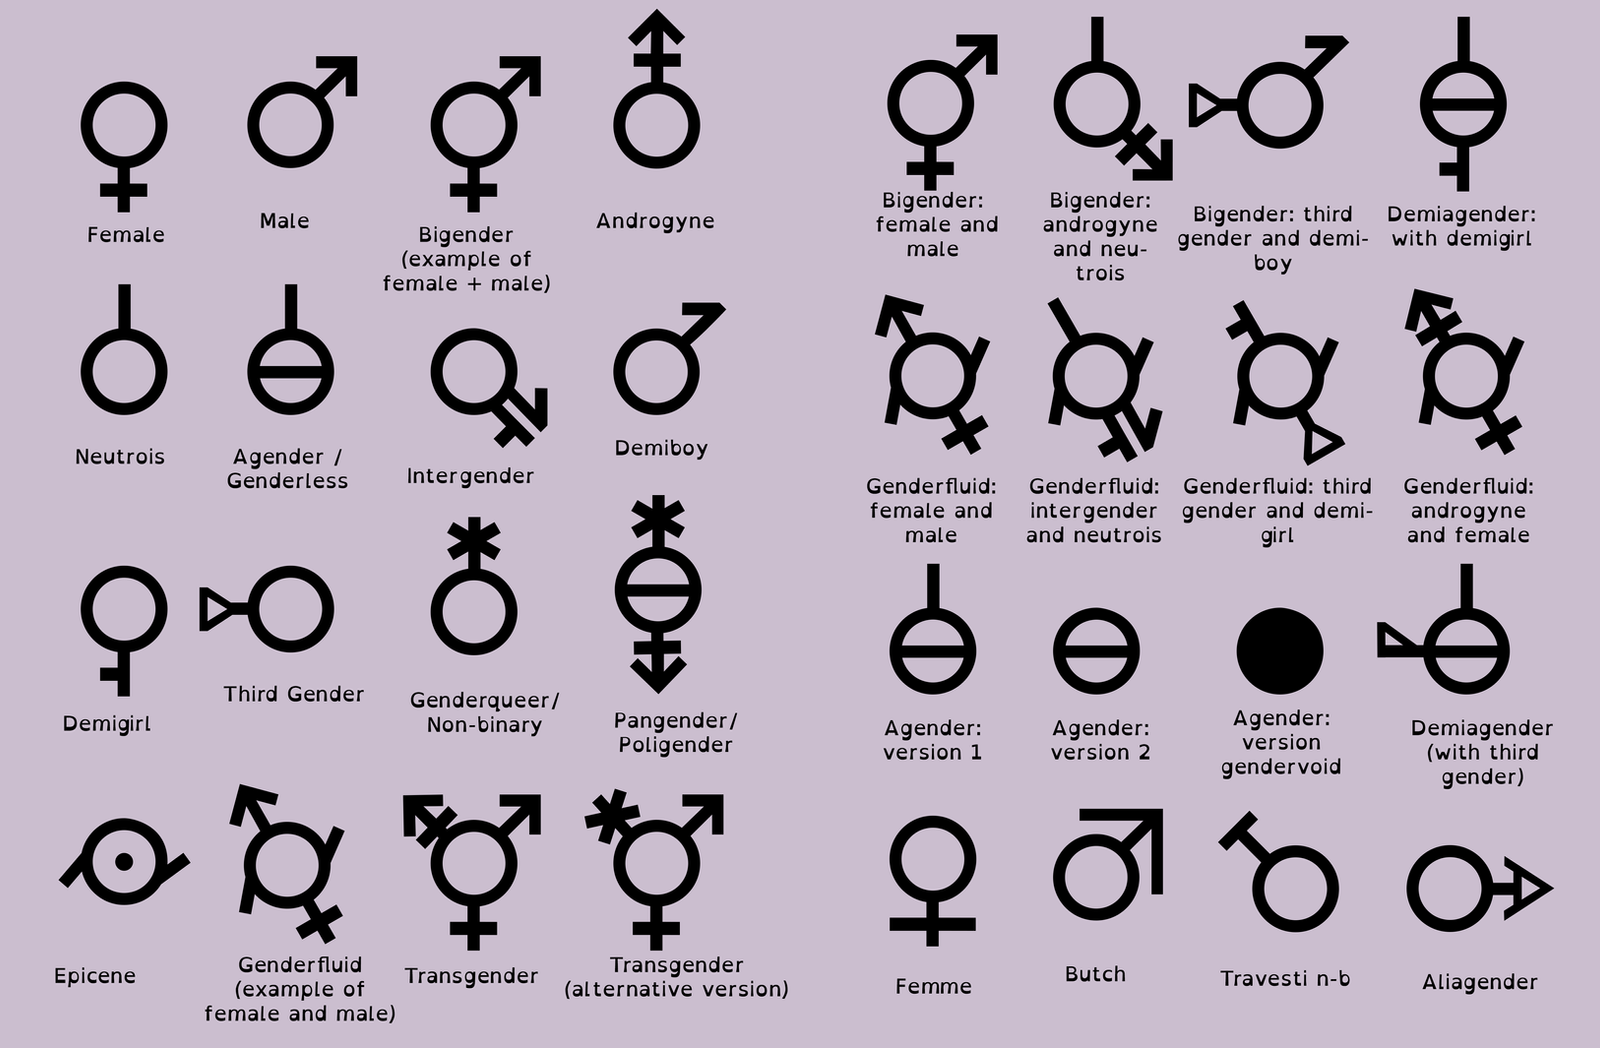 Nemesis goddess symbol images symbol and sign ideas planetary symbol for nemesis by saiyaness n goddess on deviantart gender symbols by cari rez lobo buycottarizona